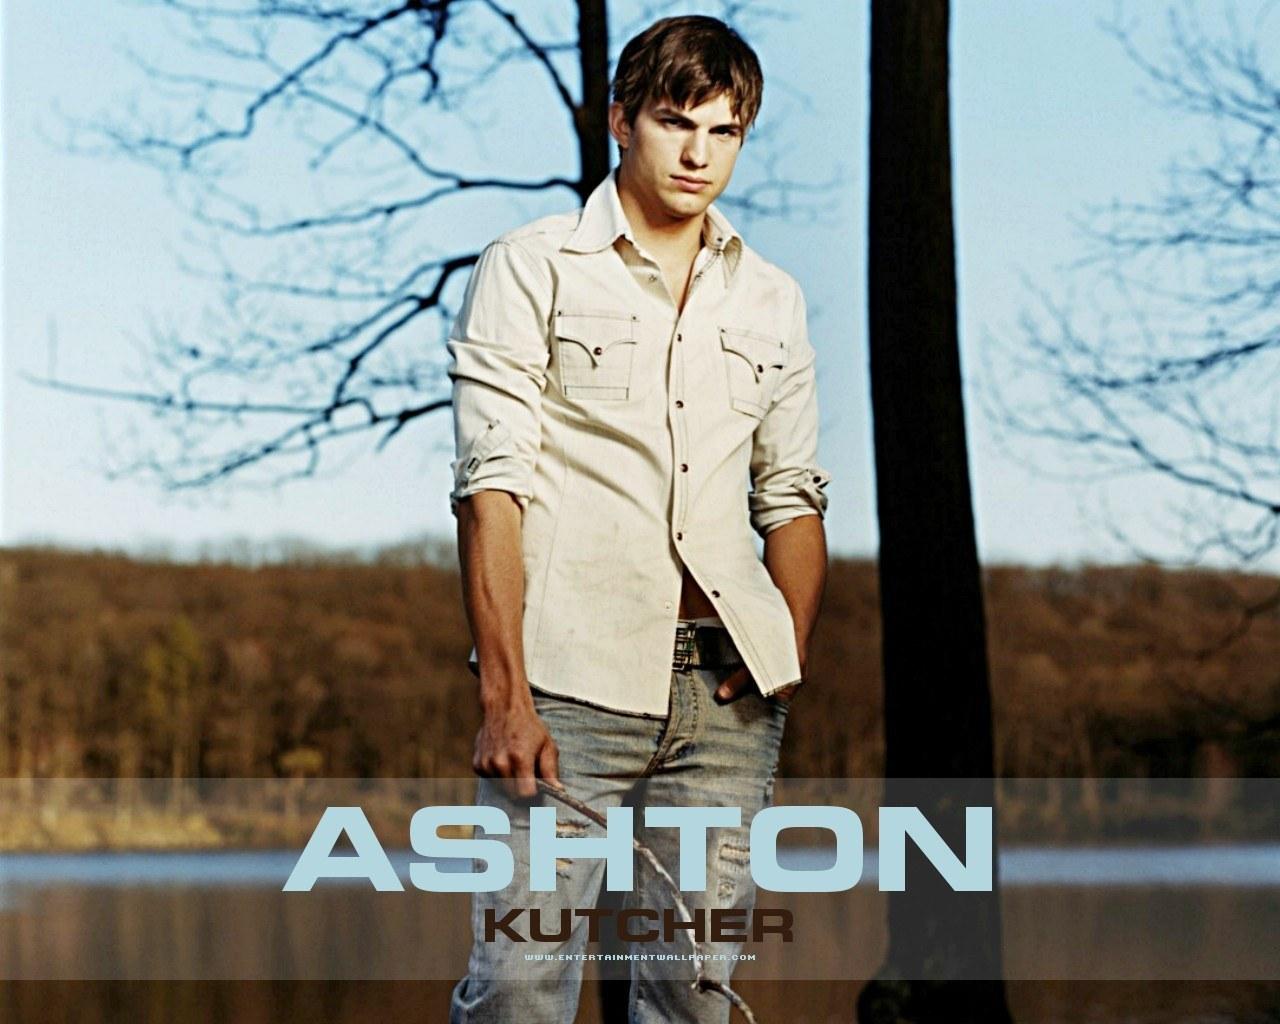 http://2.bp.blogspot.com/-JvUv34HIrIY/UI-aRSZ0LWI/AAAAAAAAOmQ/M92MDvLnDn4/s1600/Ashton-ashton-kutcher-3325018-1280-1024.jpg